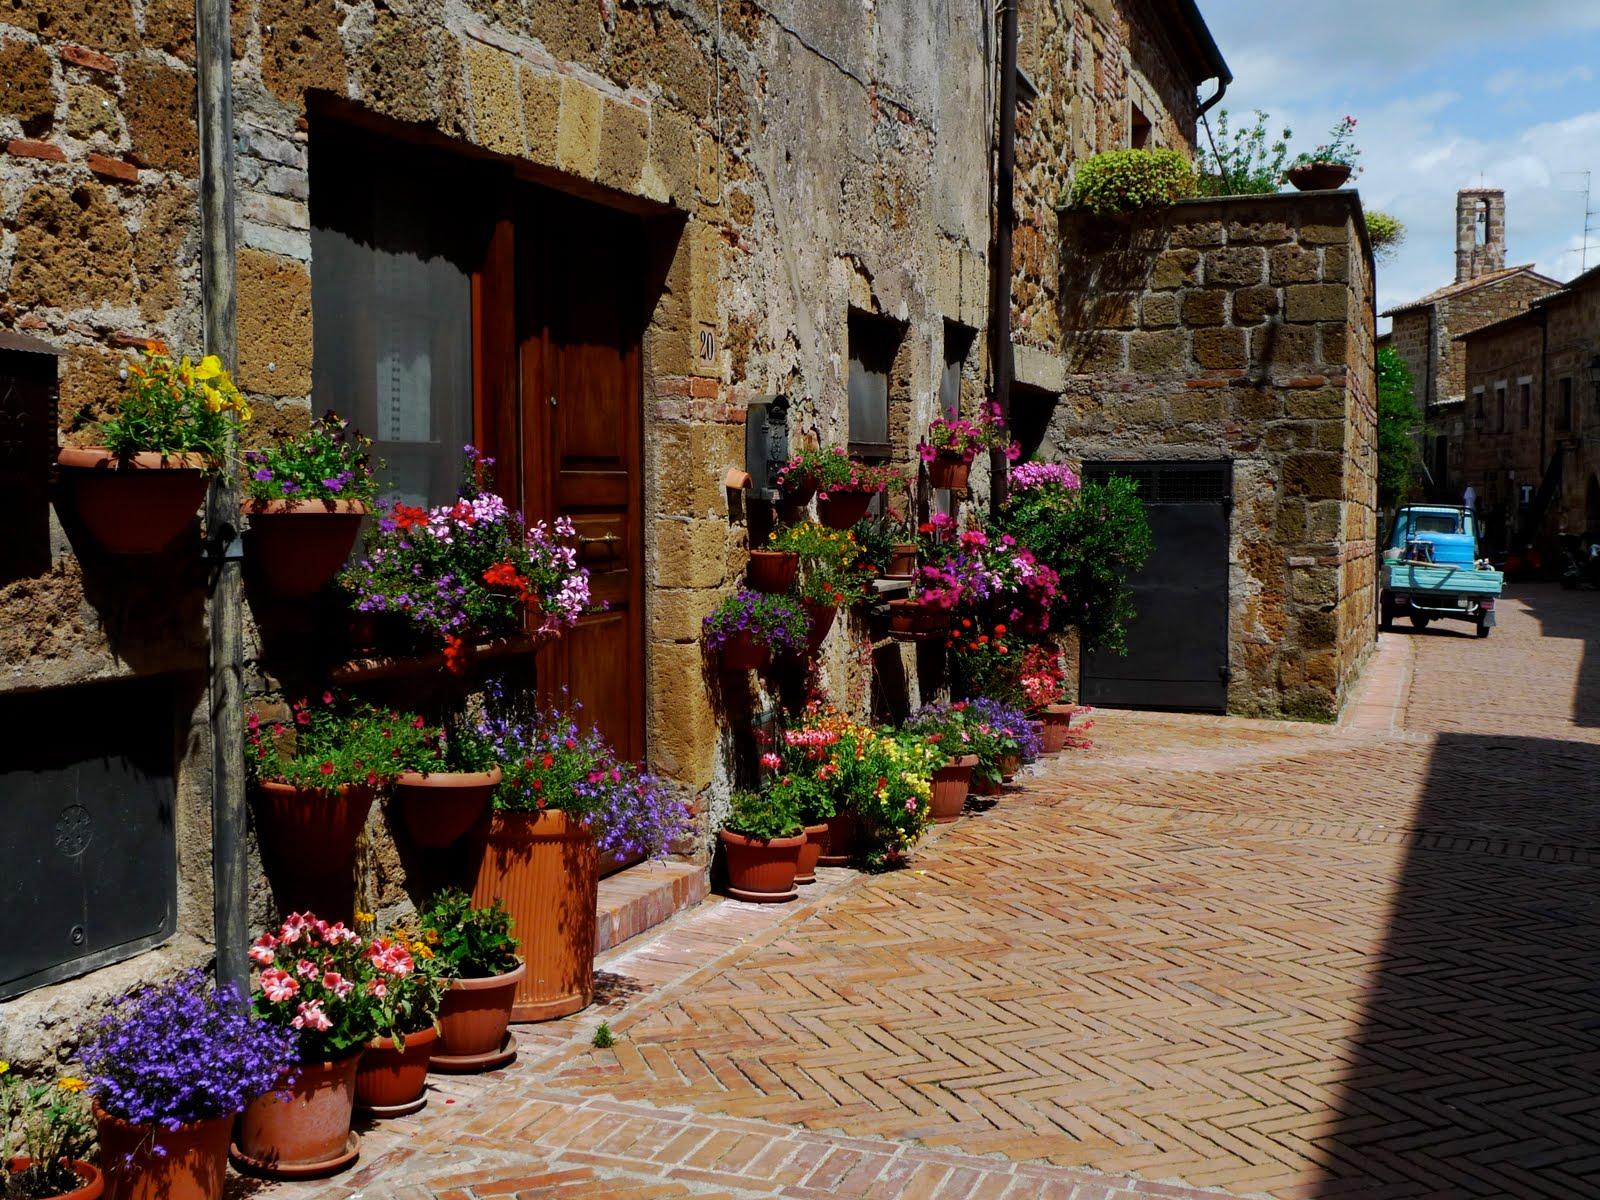 tuscany village wallpaper anghiari - photo #14